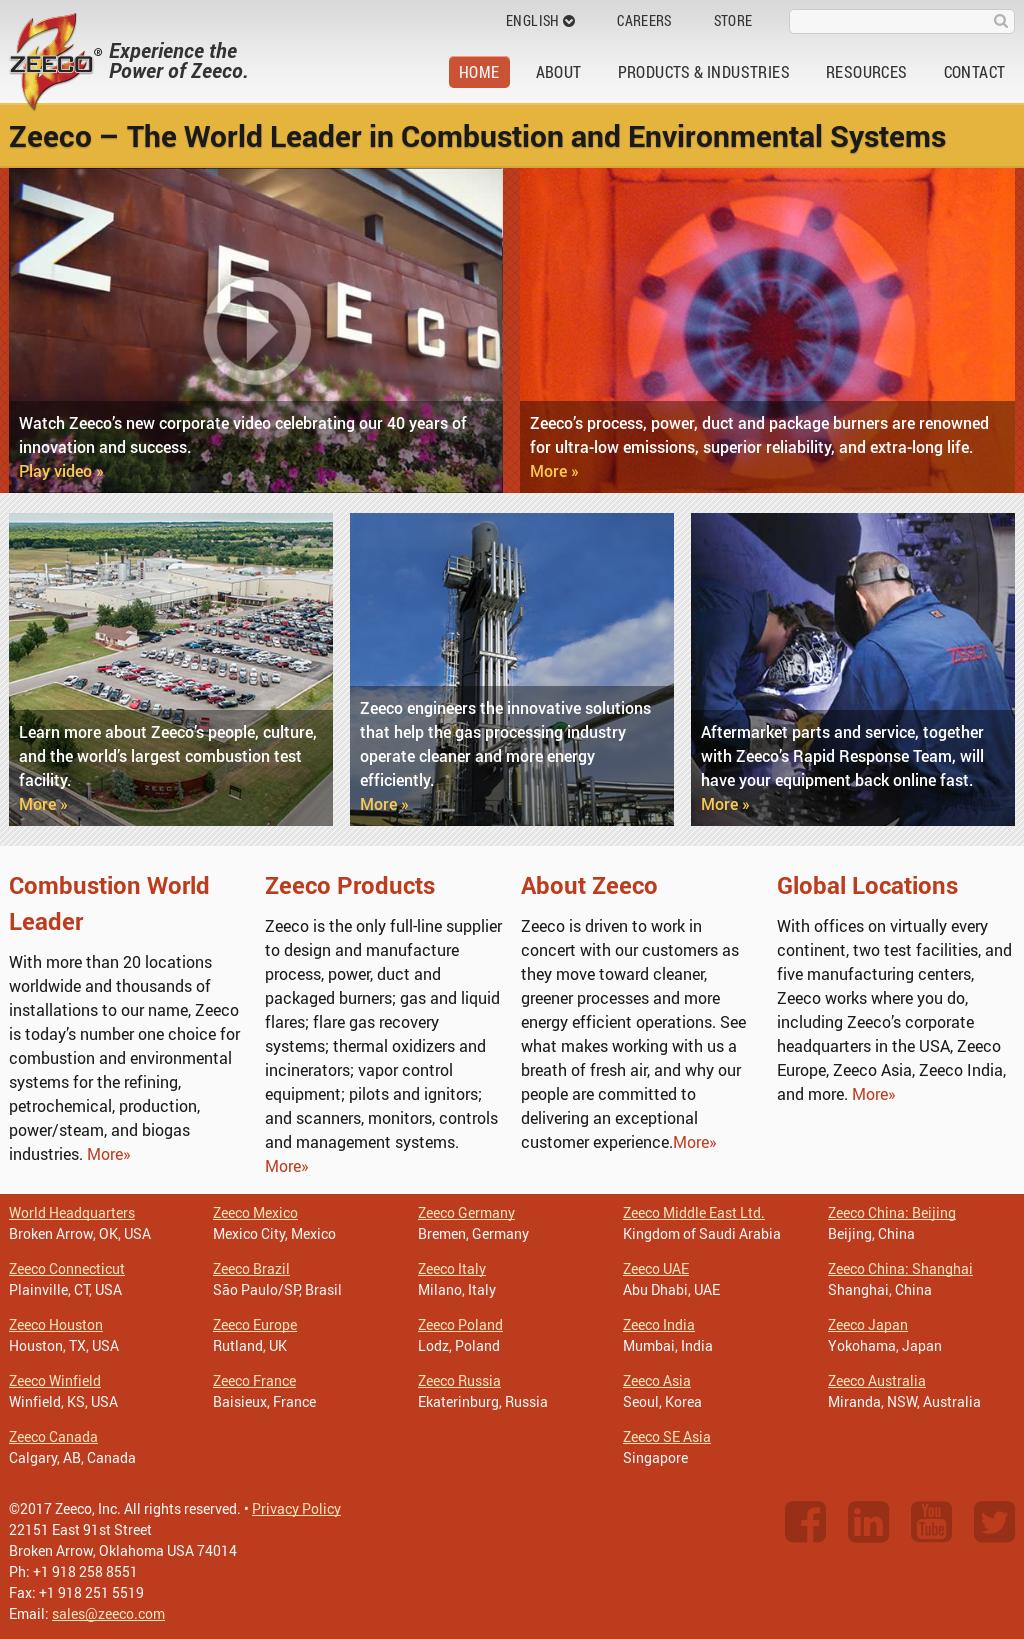 Zeeco Competitors, Revenue and Employees - Owler Company Profile